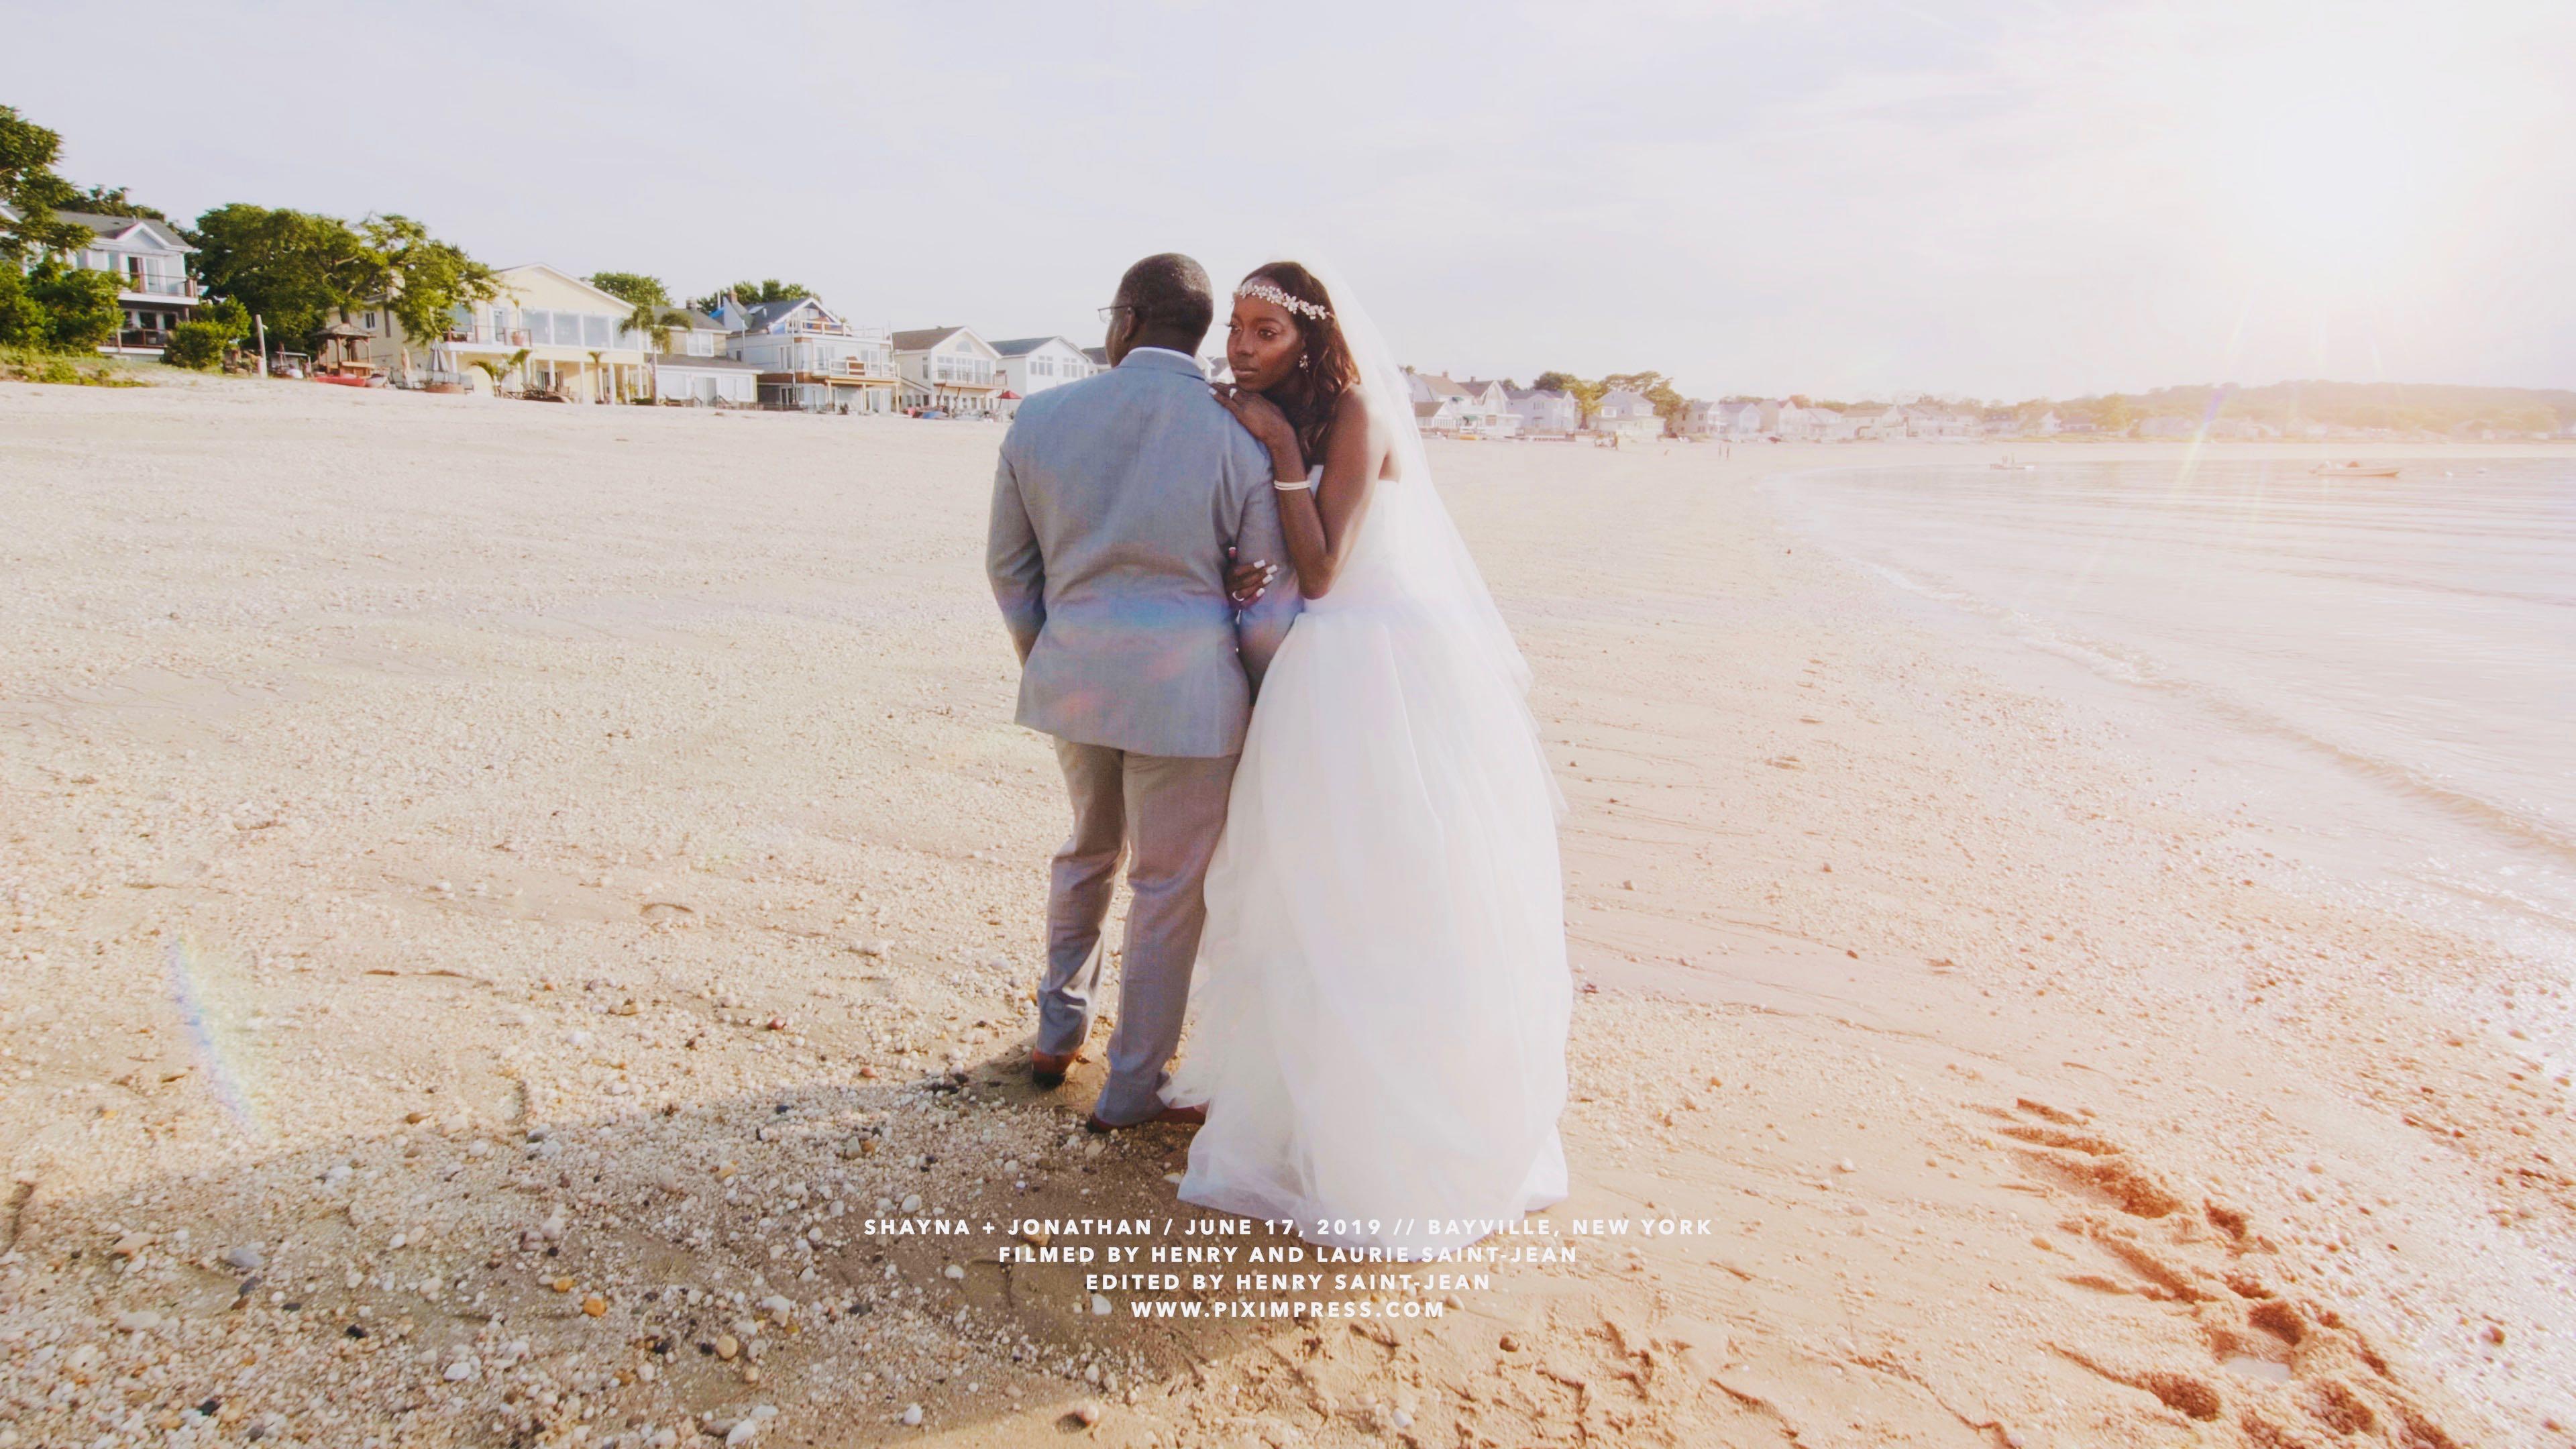 Shayna + Jonathan   Bayville, New York   The Crescent Beach